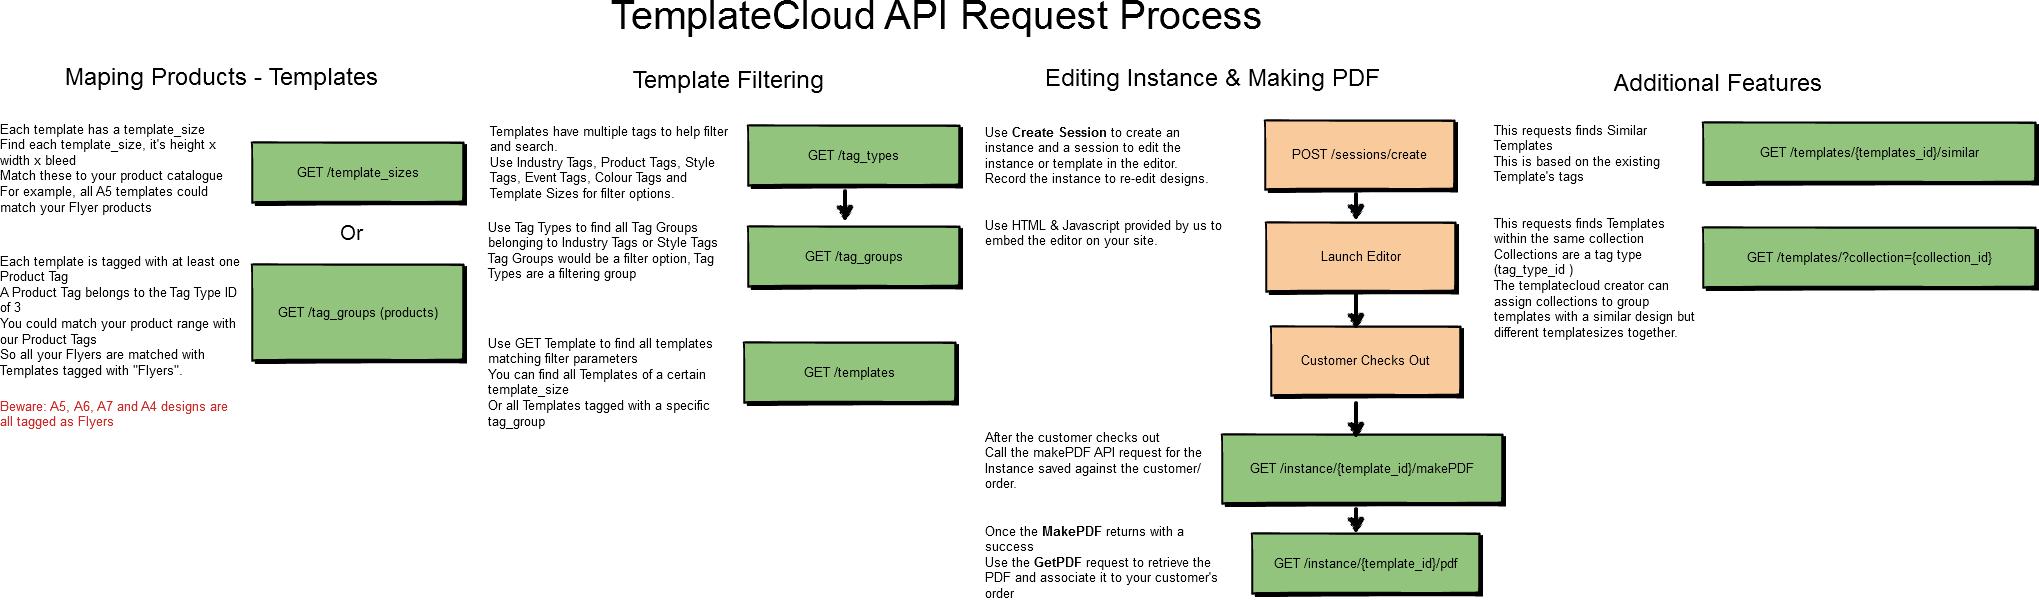 TemplateCloud API Guide   w3pedia